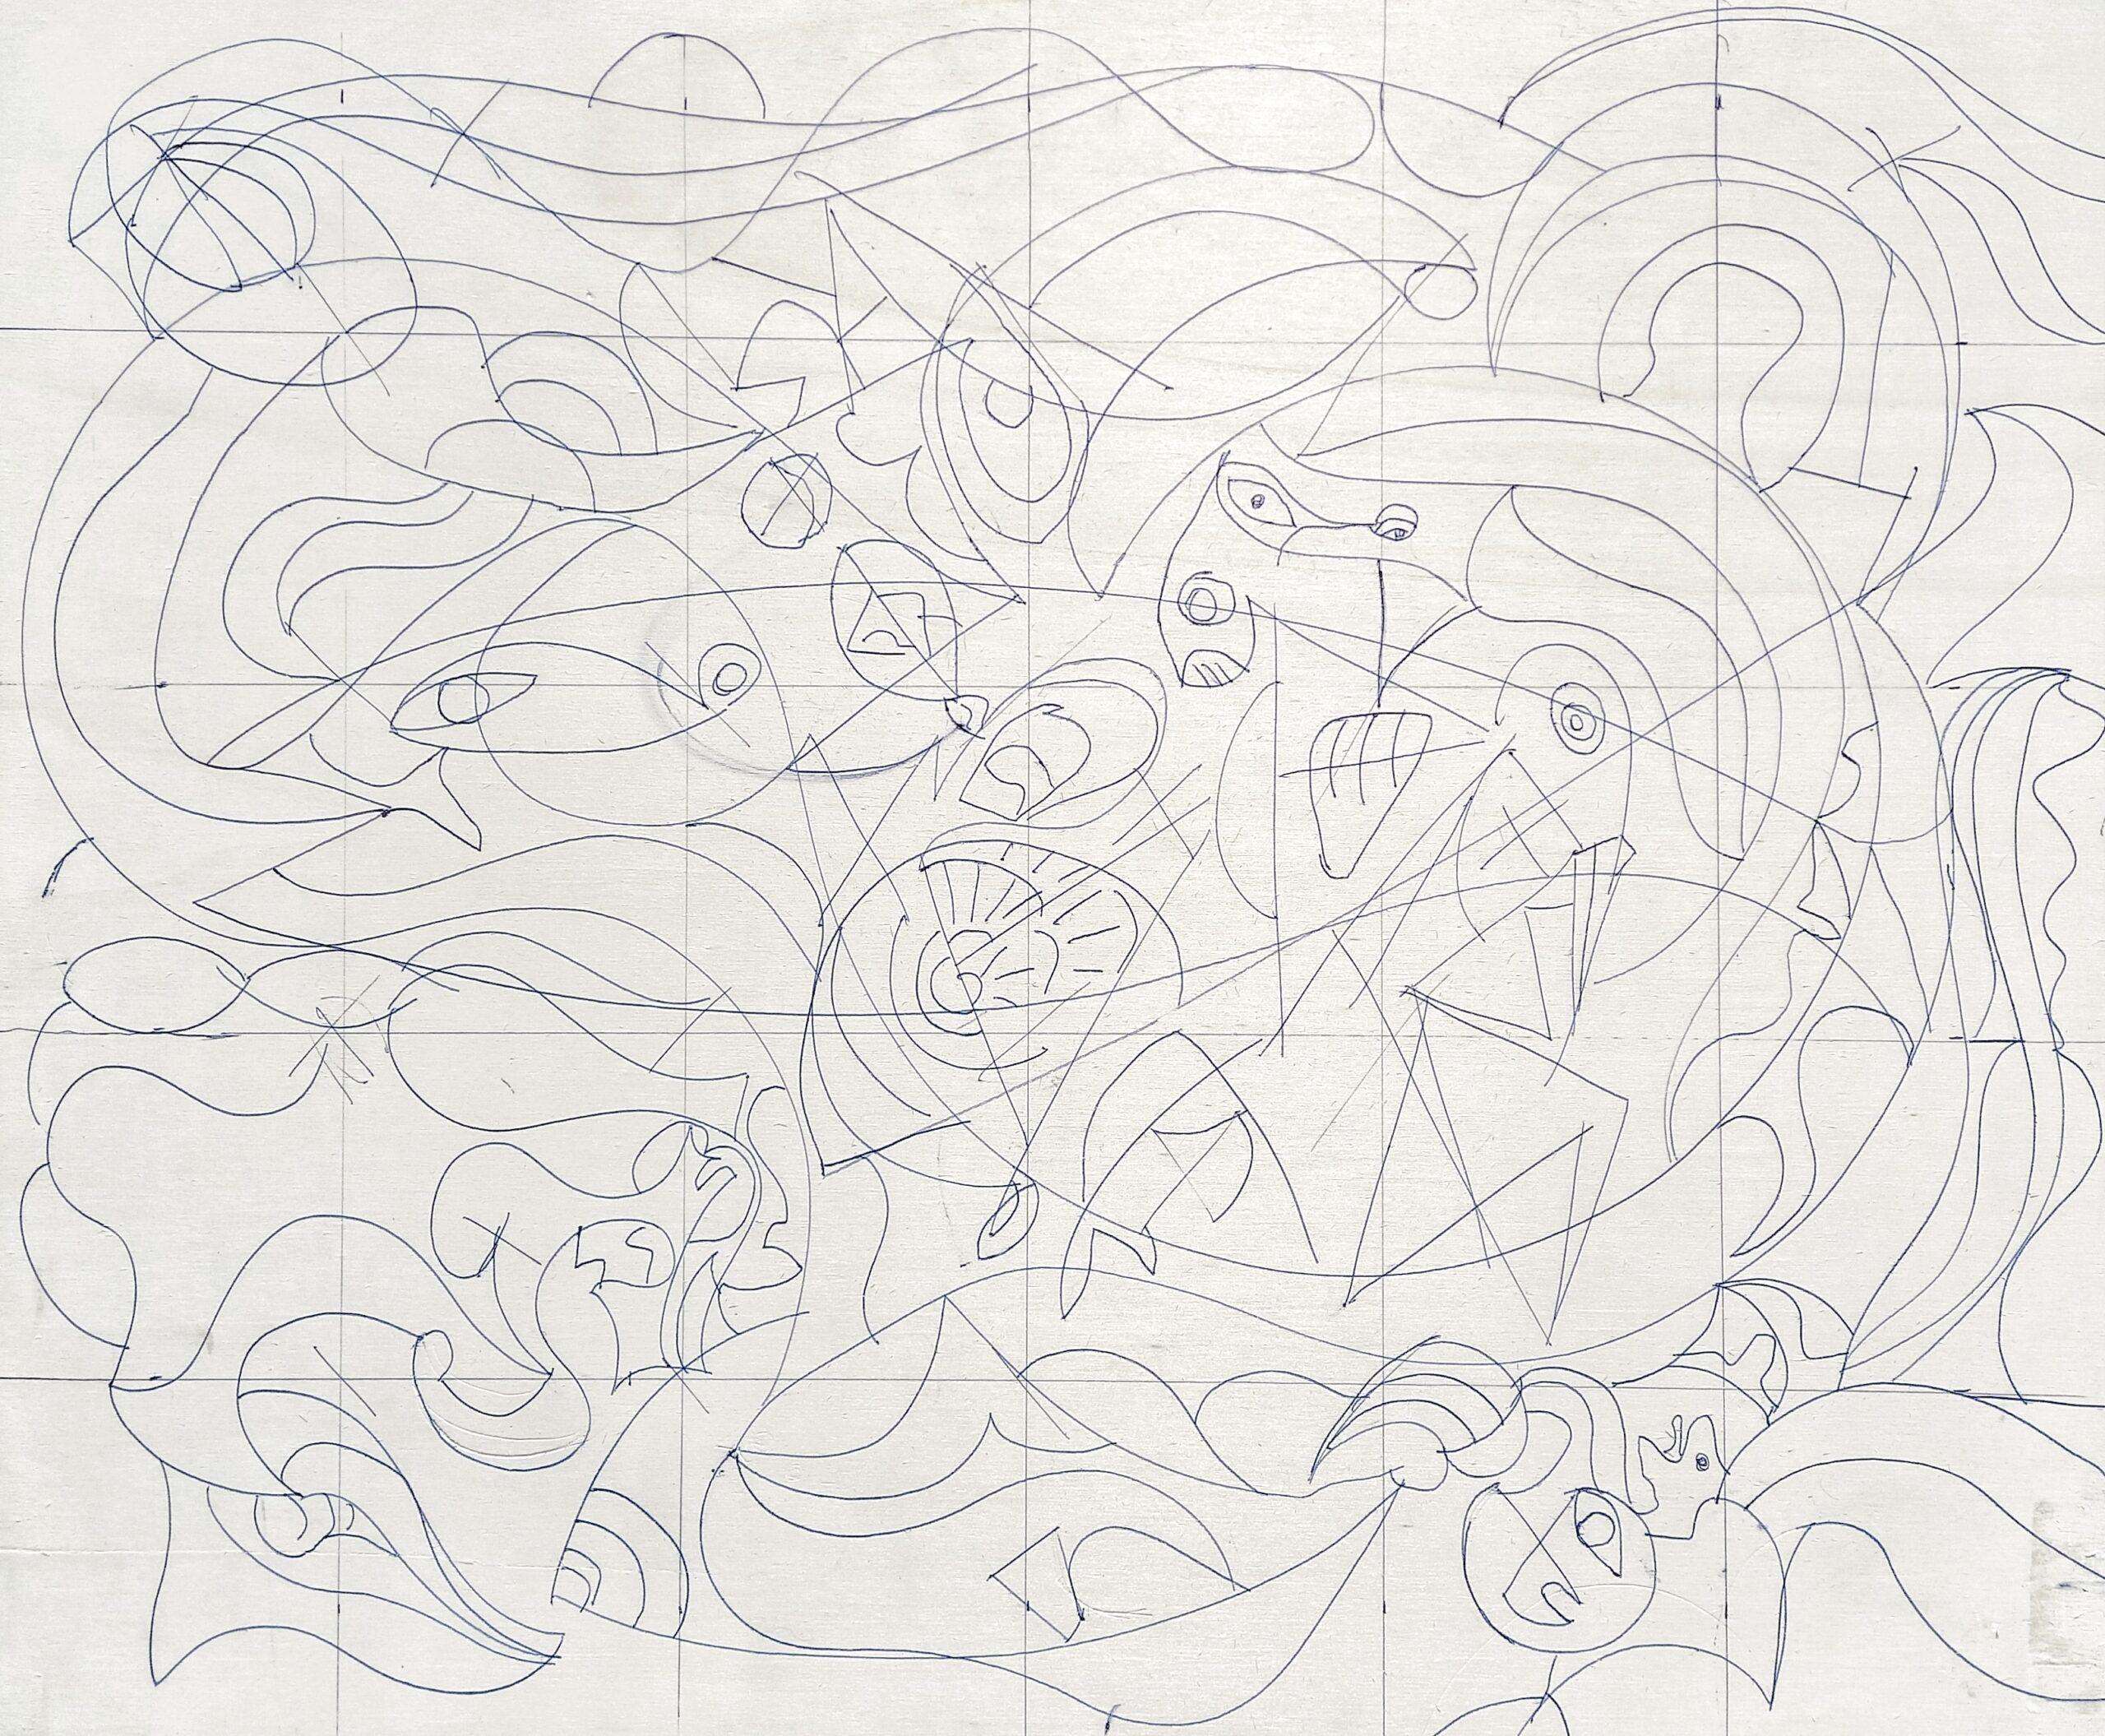 30/10/10 Work in Progress Acrylic 61/51 cm. - Arti Visive Bepart Gallery, Atelier Montez Roma